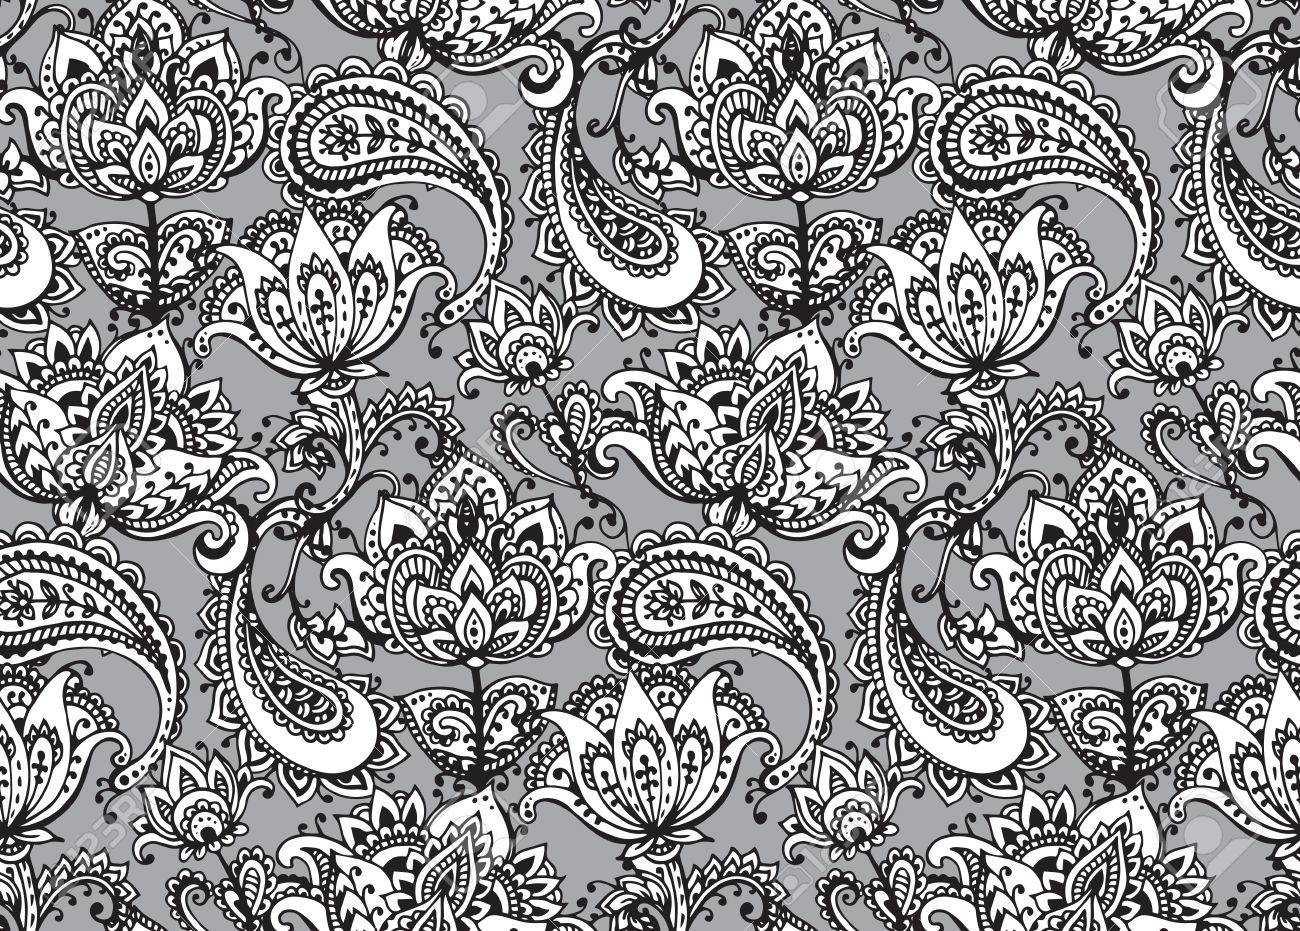 Henna Mehndi Vector : Vector seamless pattern with hand drawn henna mehndi design floral